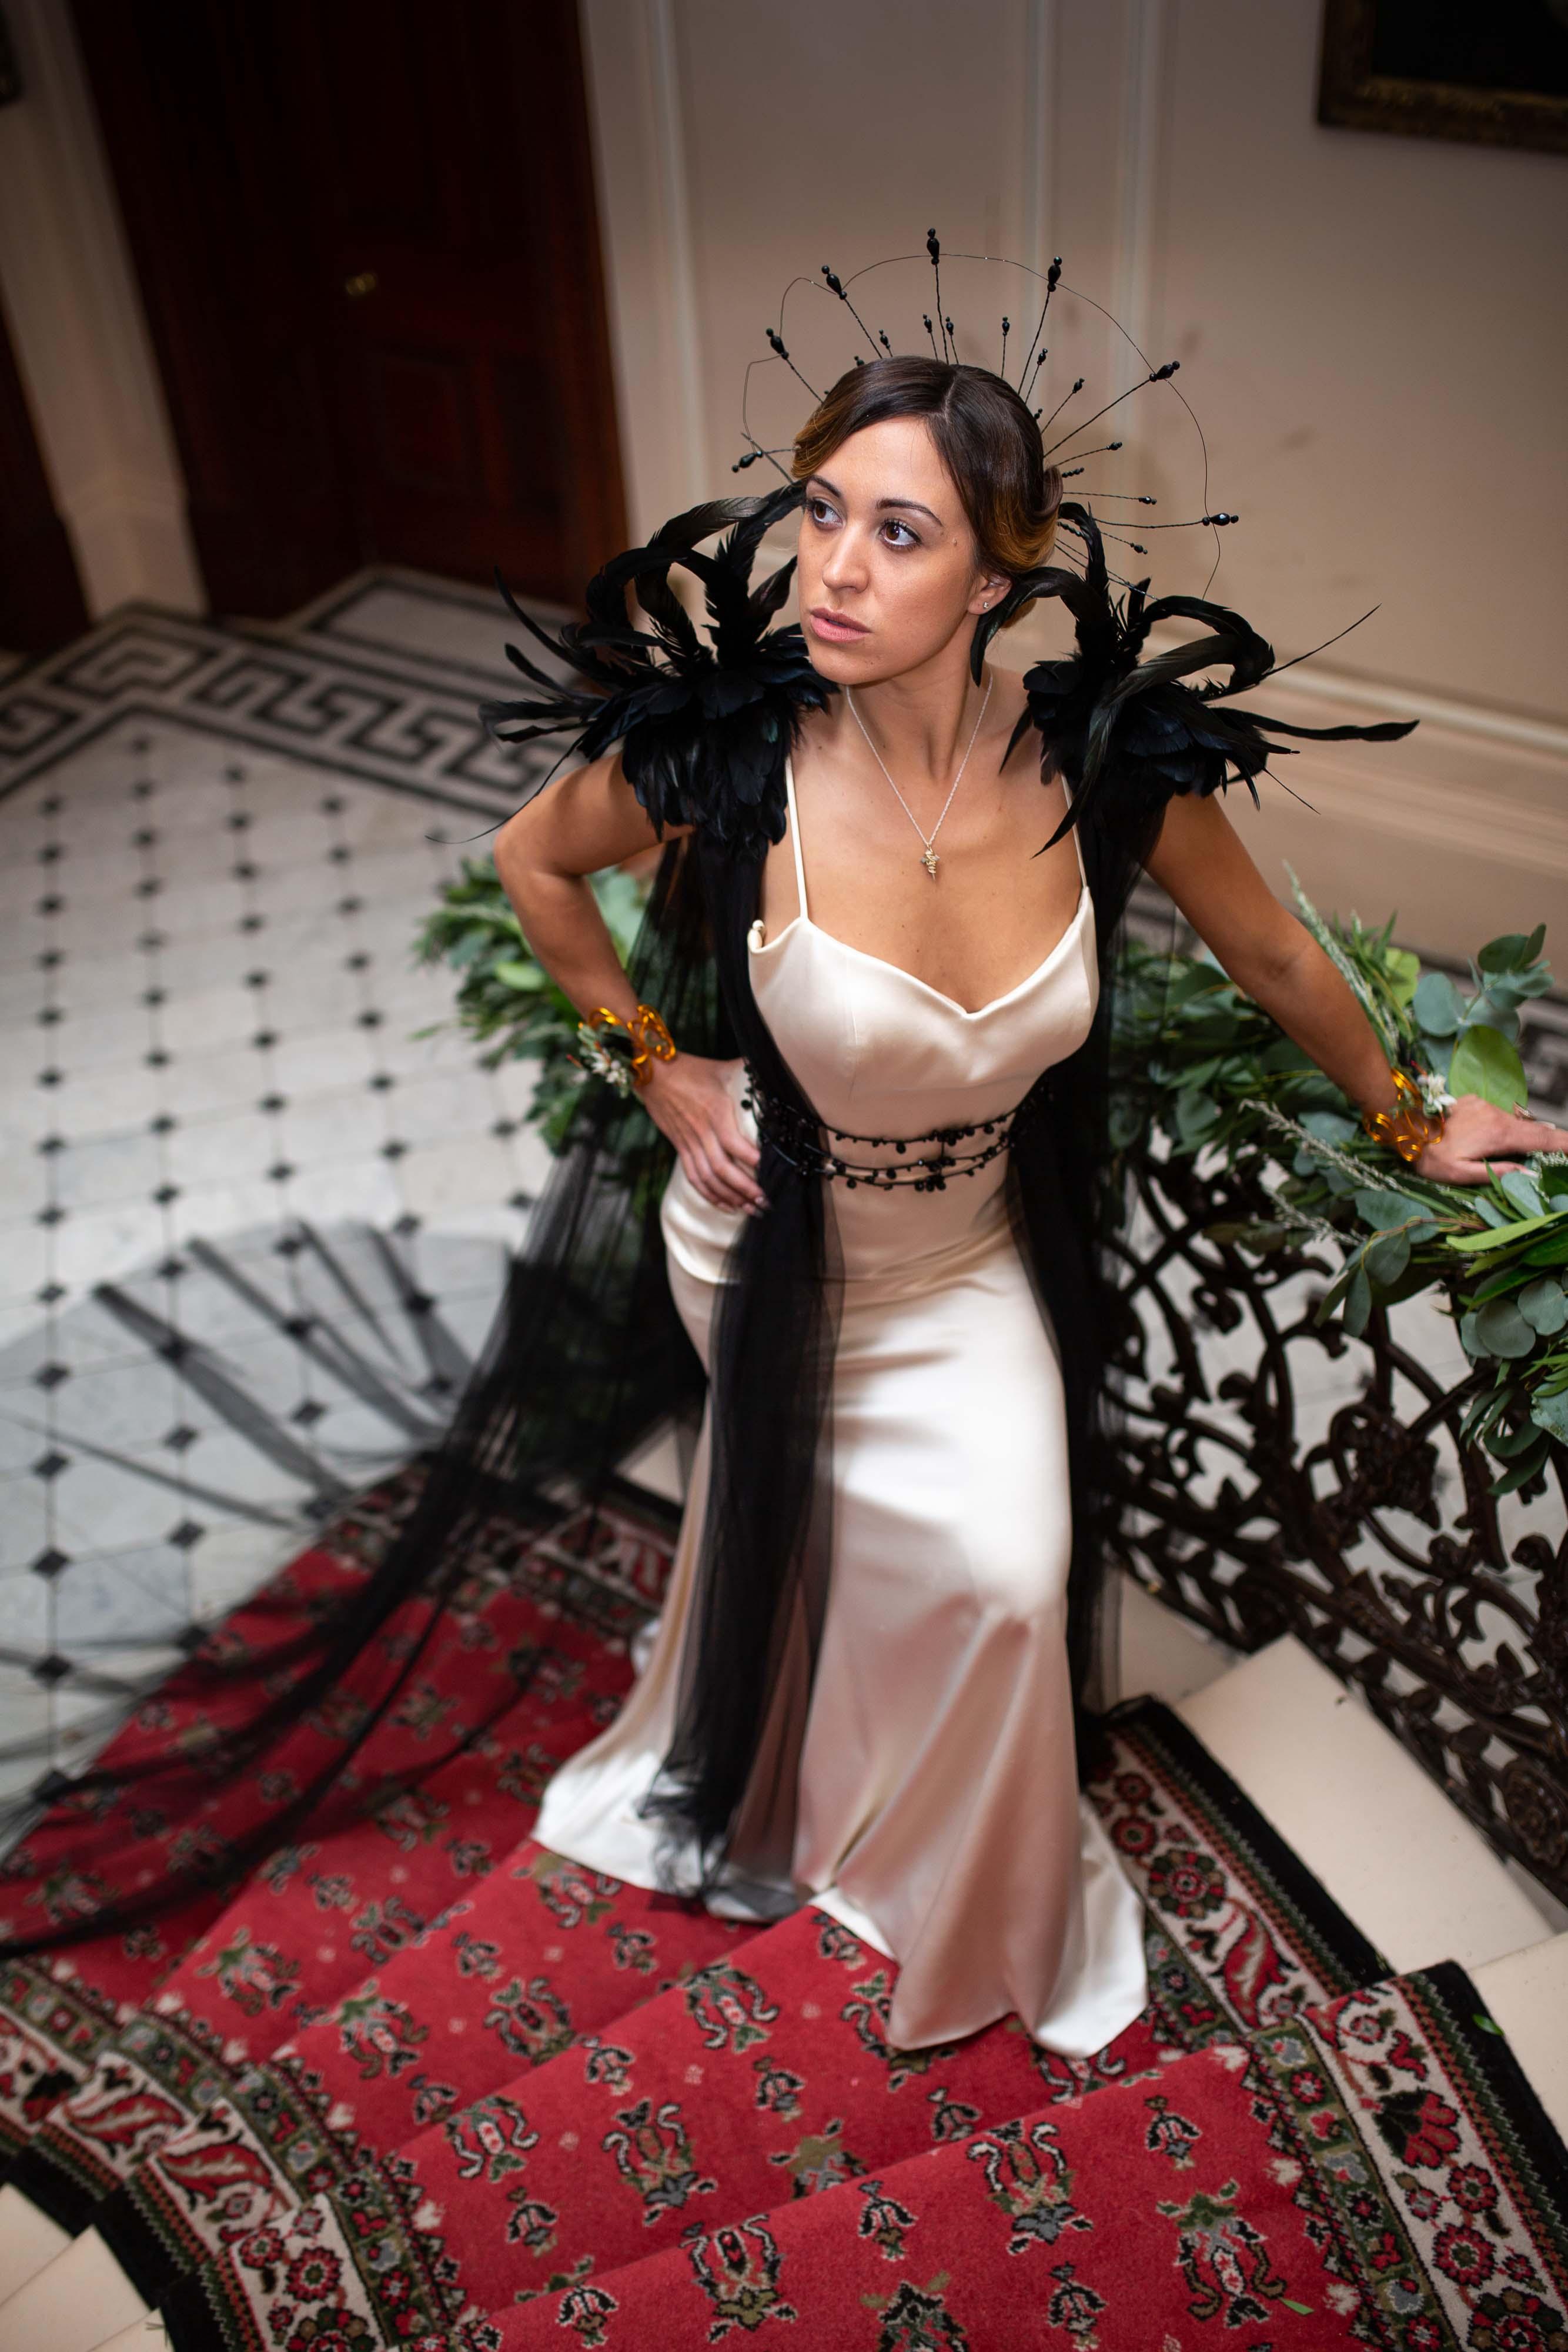 iconic wedding looks- music themed wedding- unconventional wedding- alternative wedding- lady gaga style-alternative wedding dress- unique wedding dress- lady gaga style- black and white wedding dress